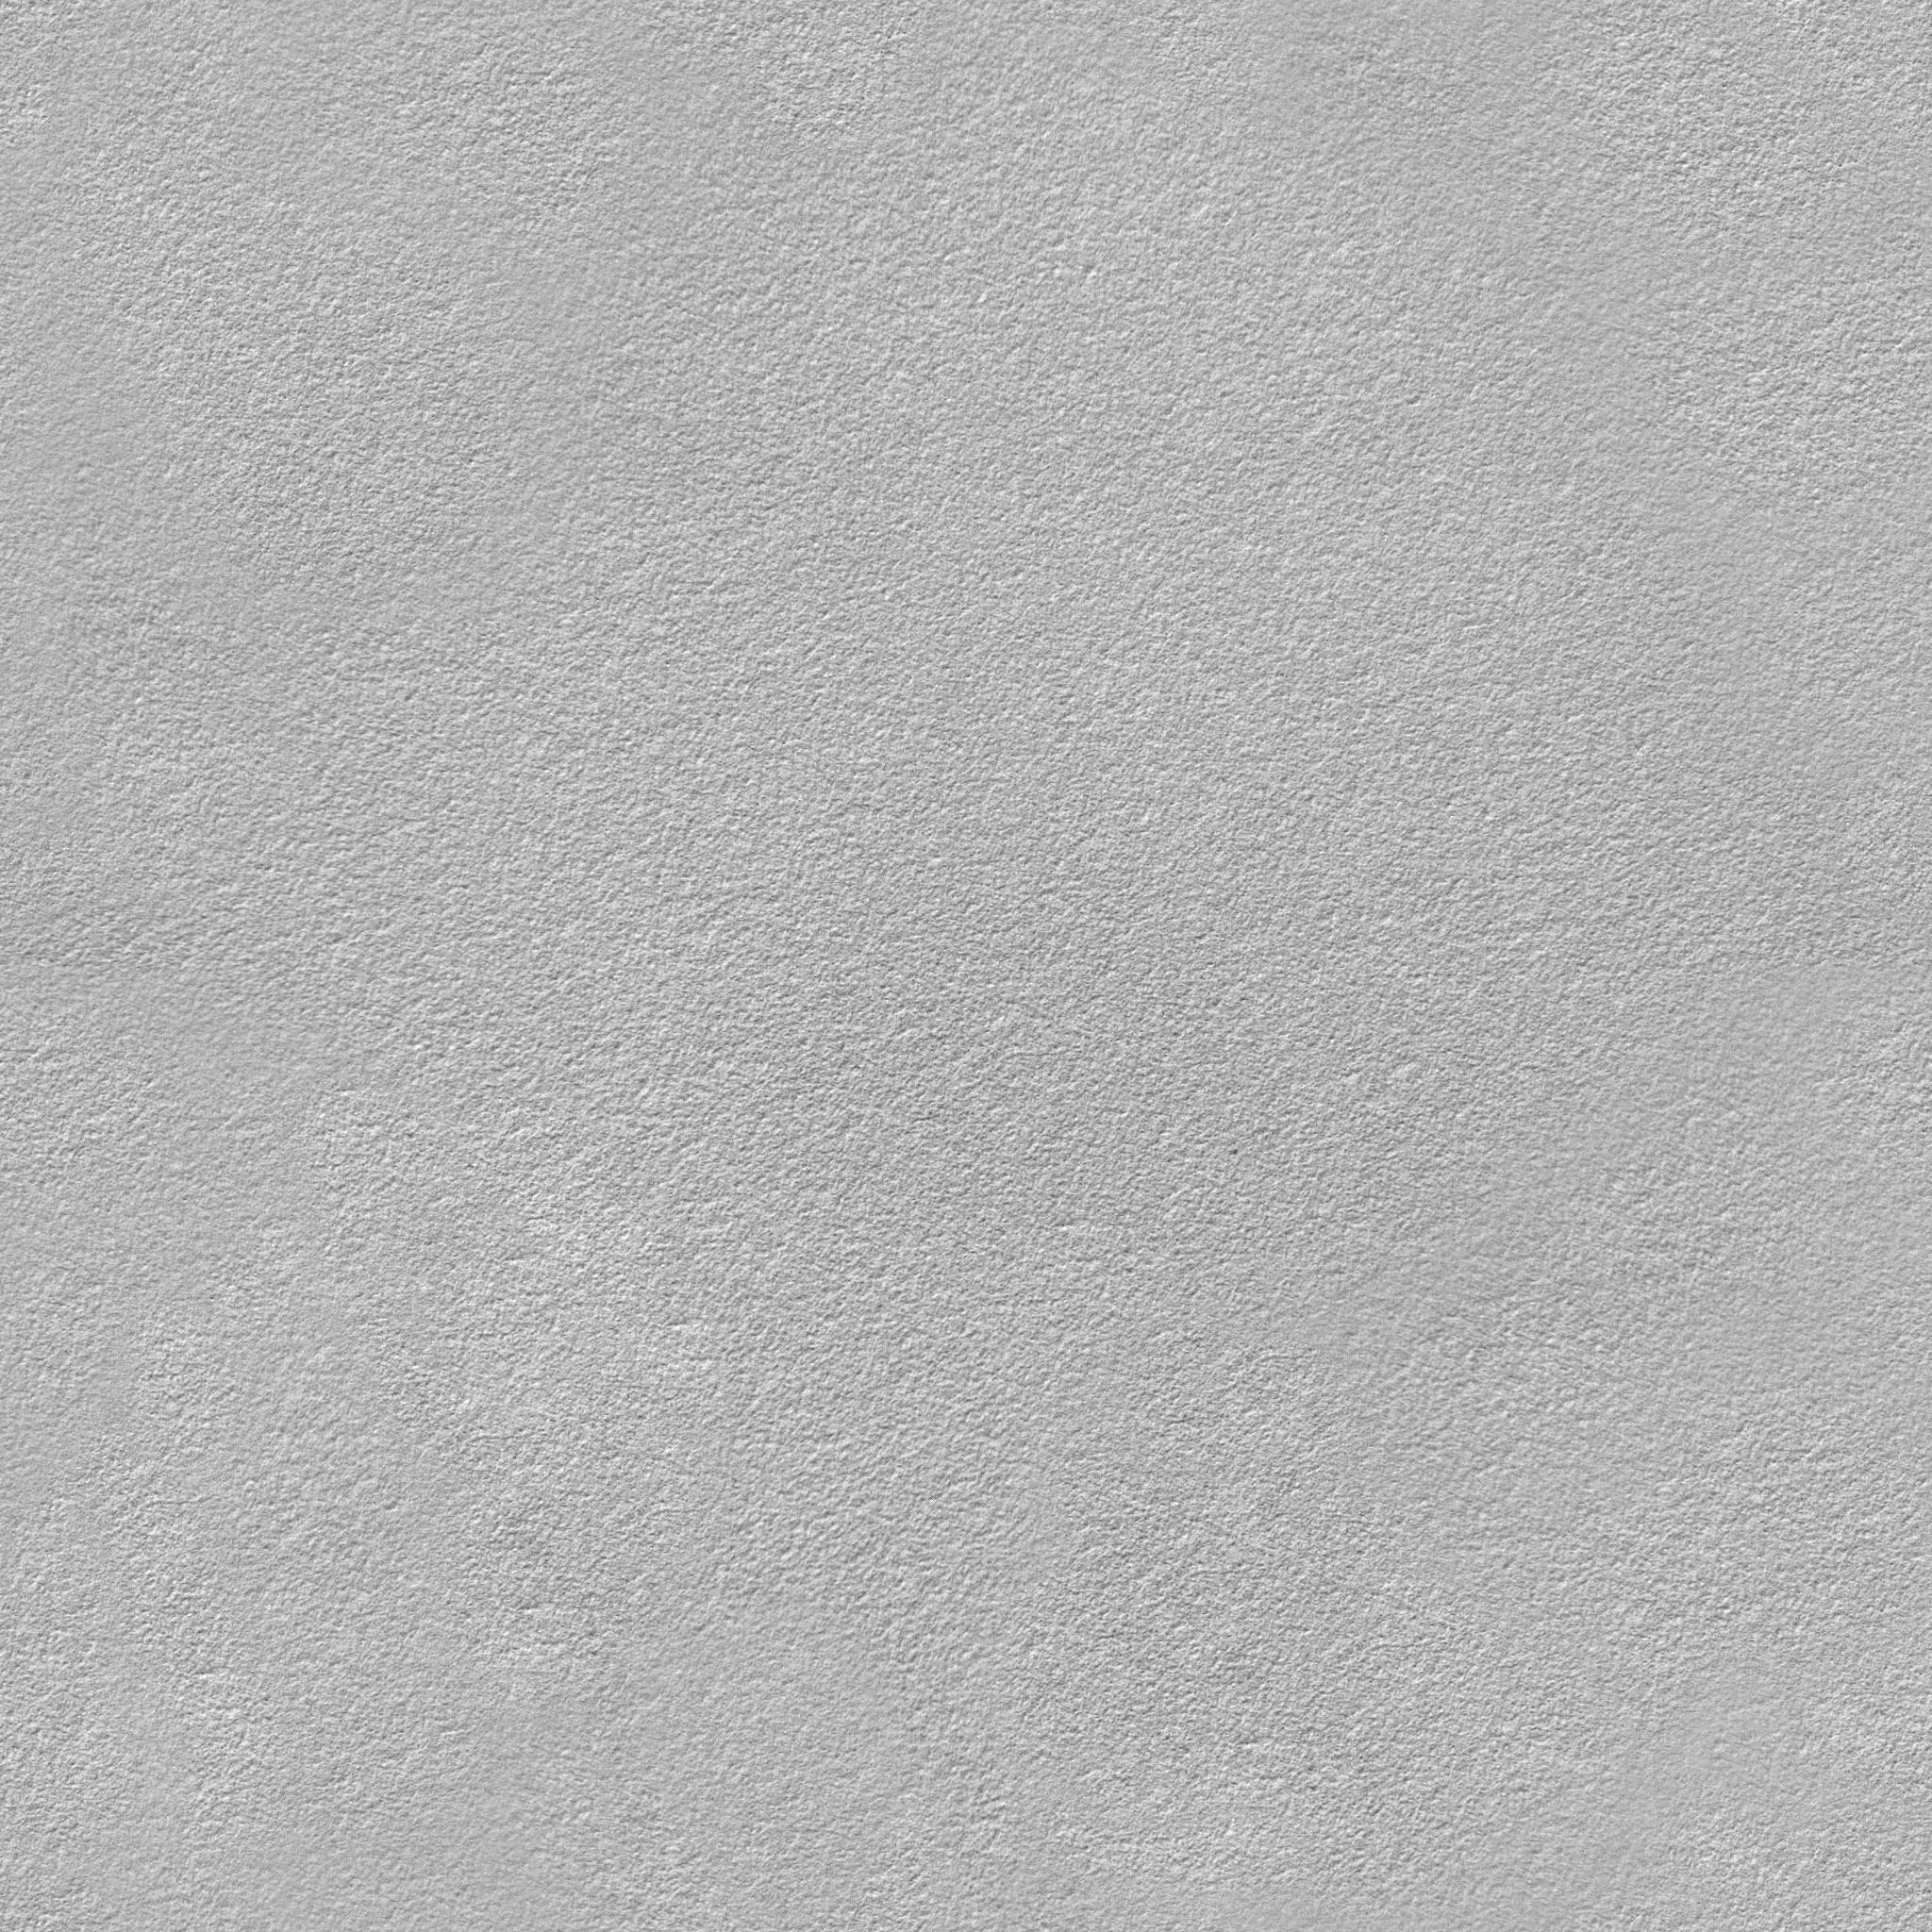 Concrete Seamless Texture Set By Holochipgraphics